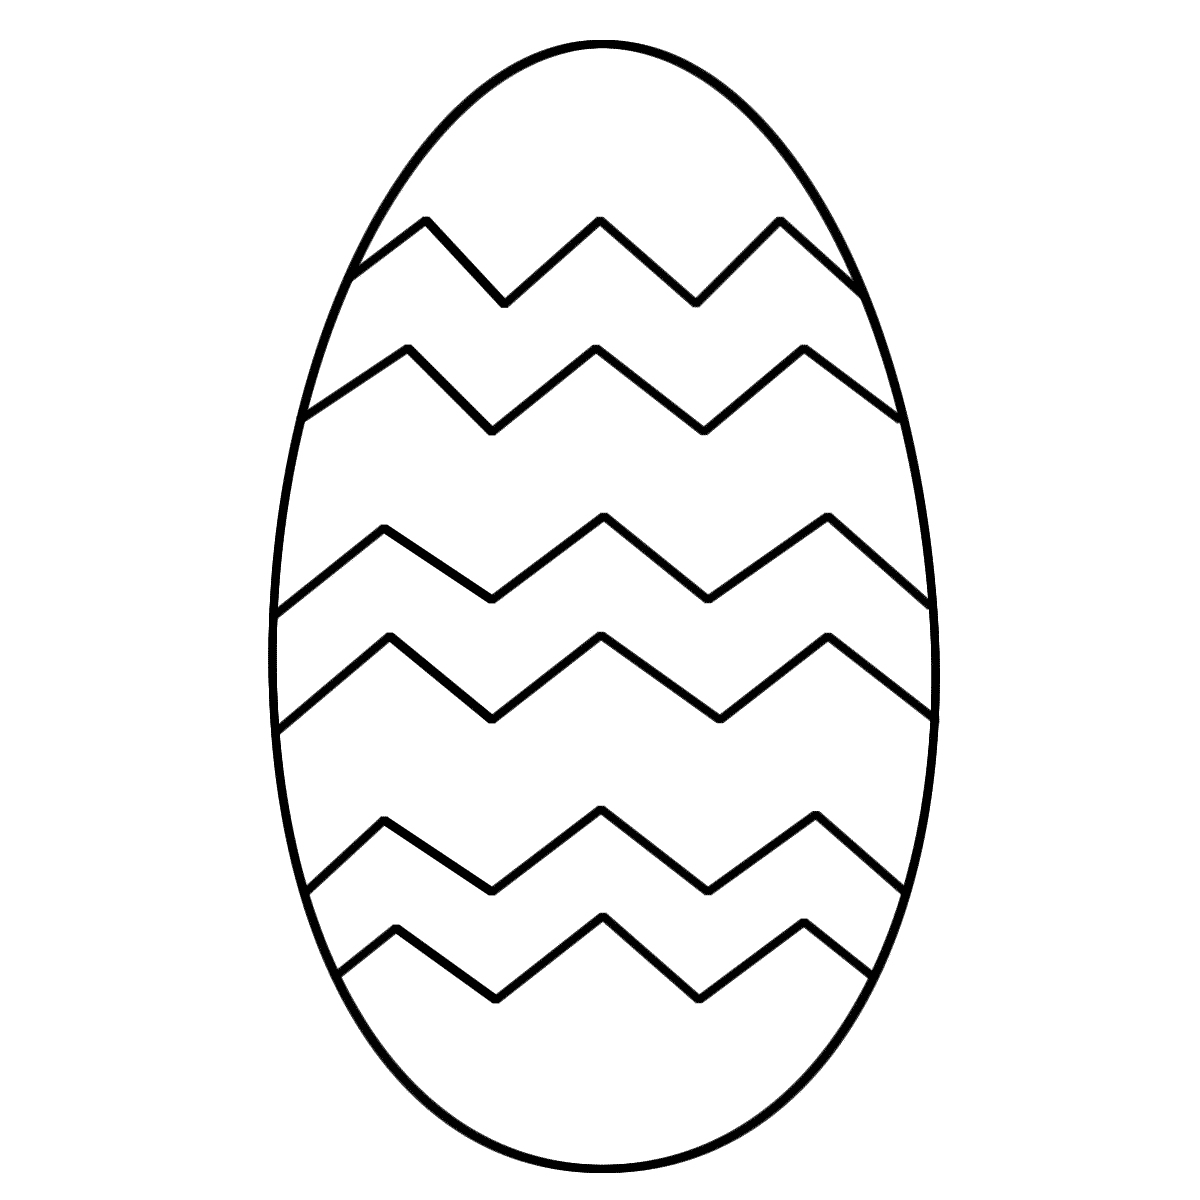 Free Printable Easter Egg Vector Stock - Rr Collections - Easter Egg Template Free Printable